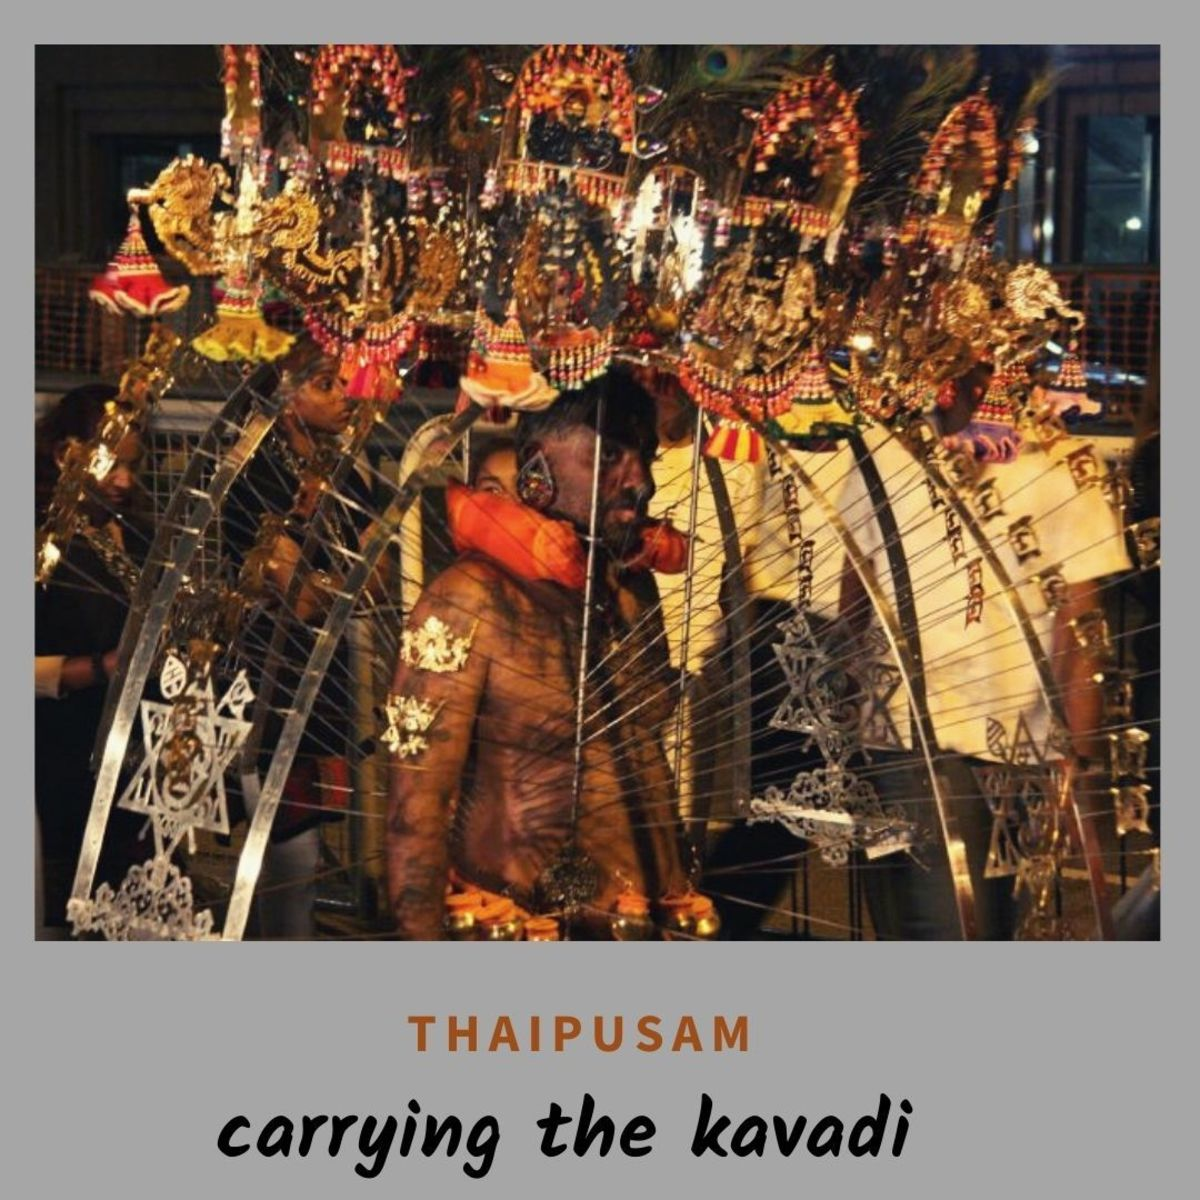 Carrying Kavadi during Thaipusam Celebration